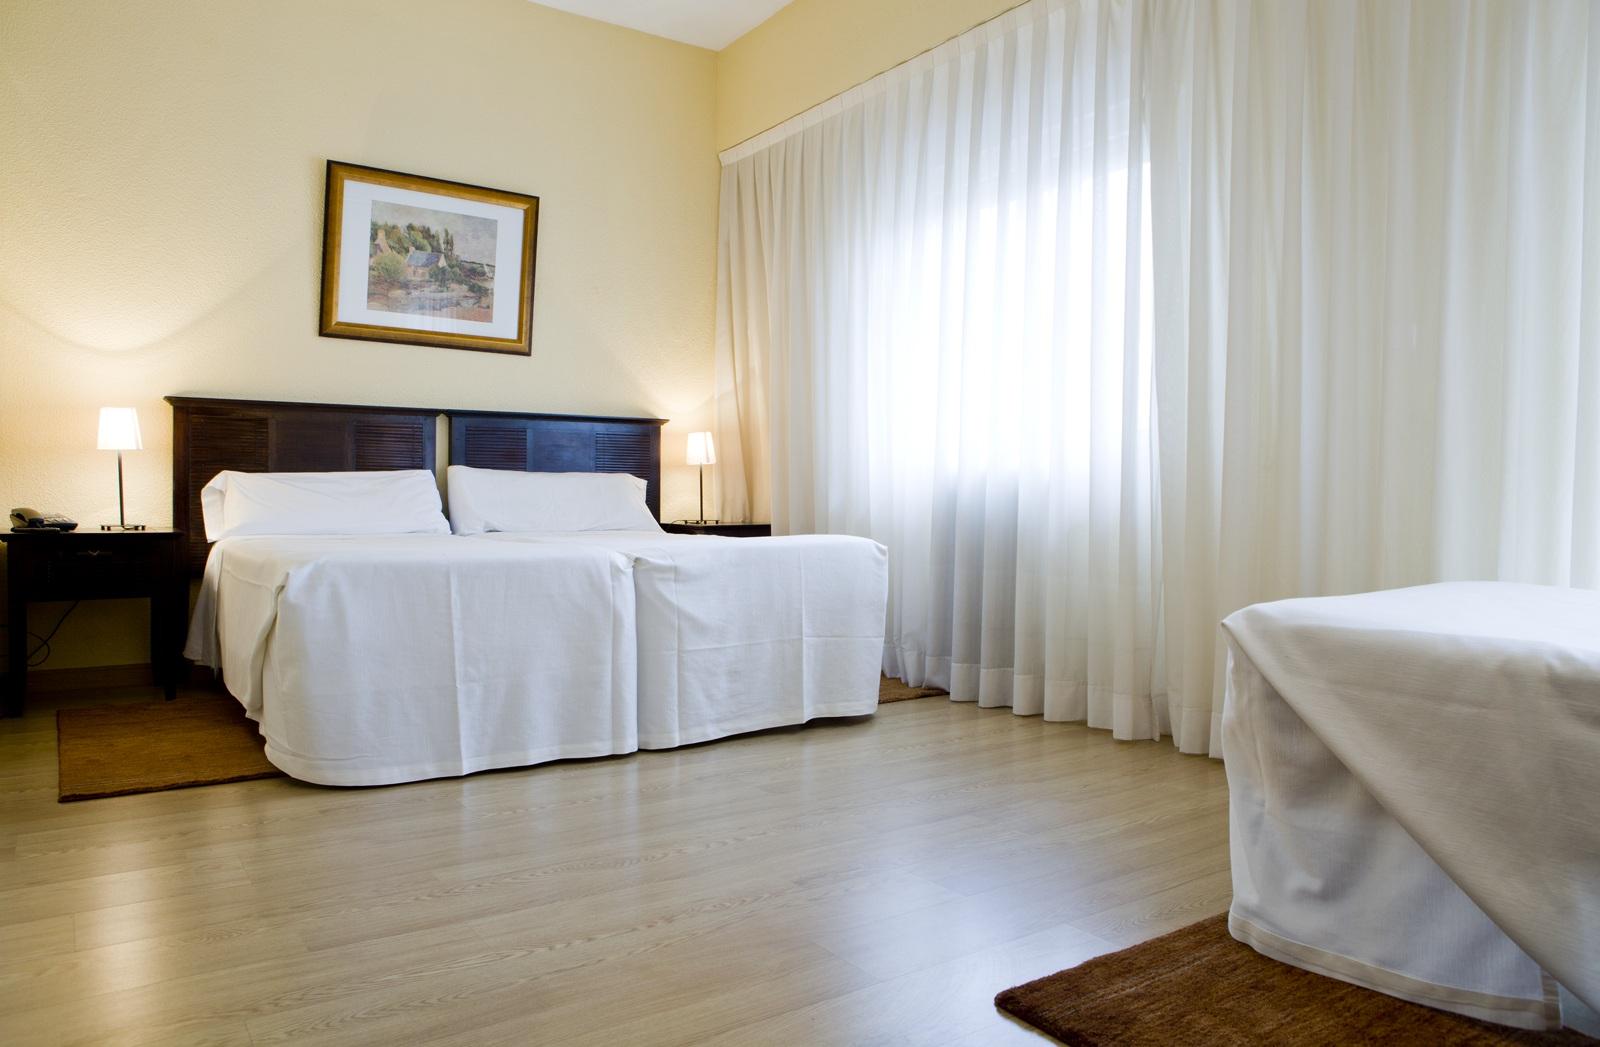 HOSTAL RESIDENCIA DON DIEGO - Hotel cerca del Museo Reina Sofía